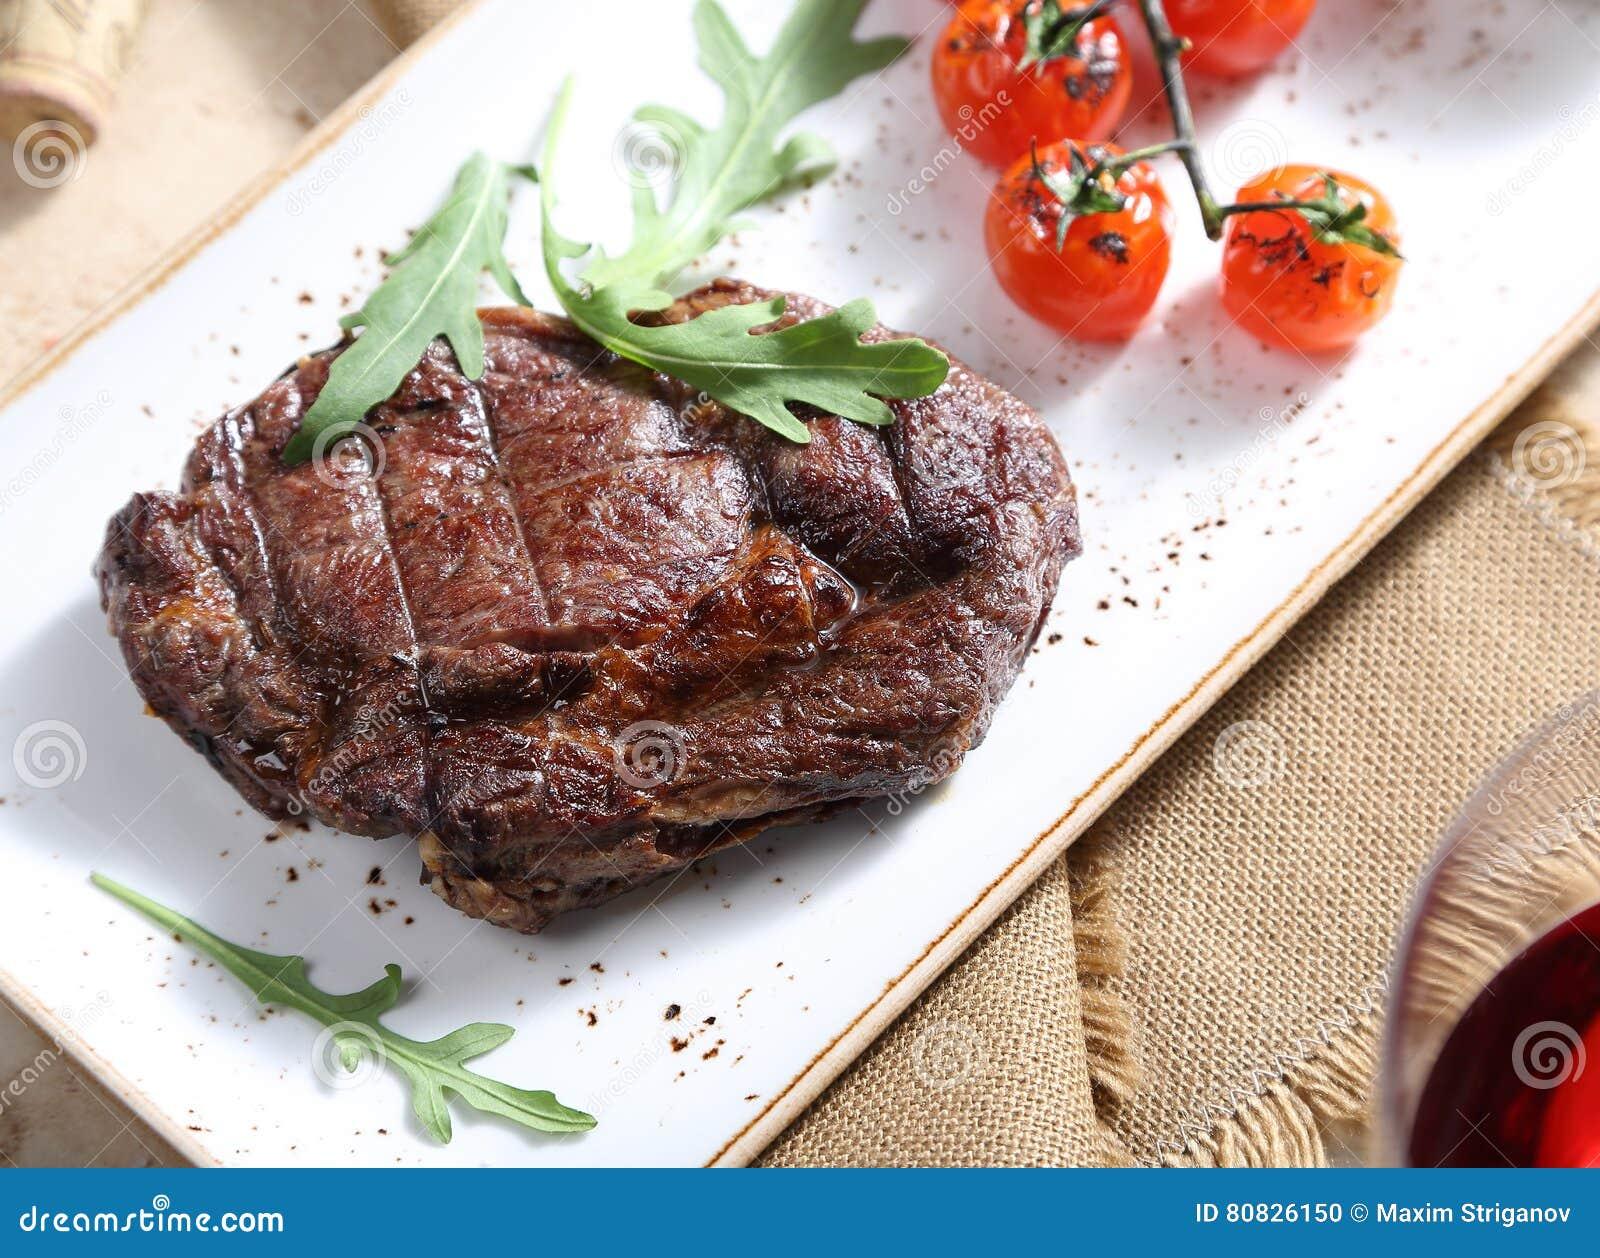 Bifteck de boeuf